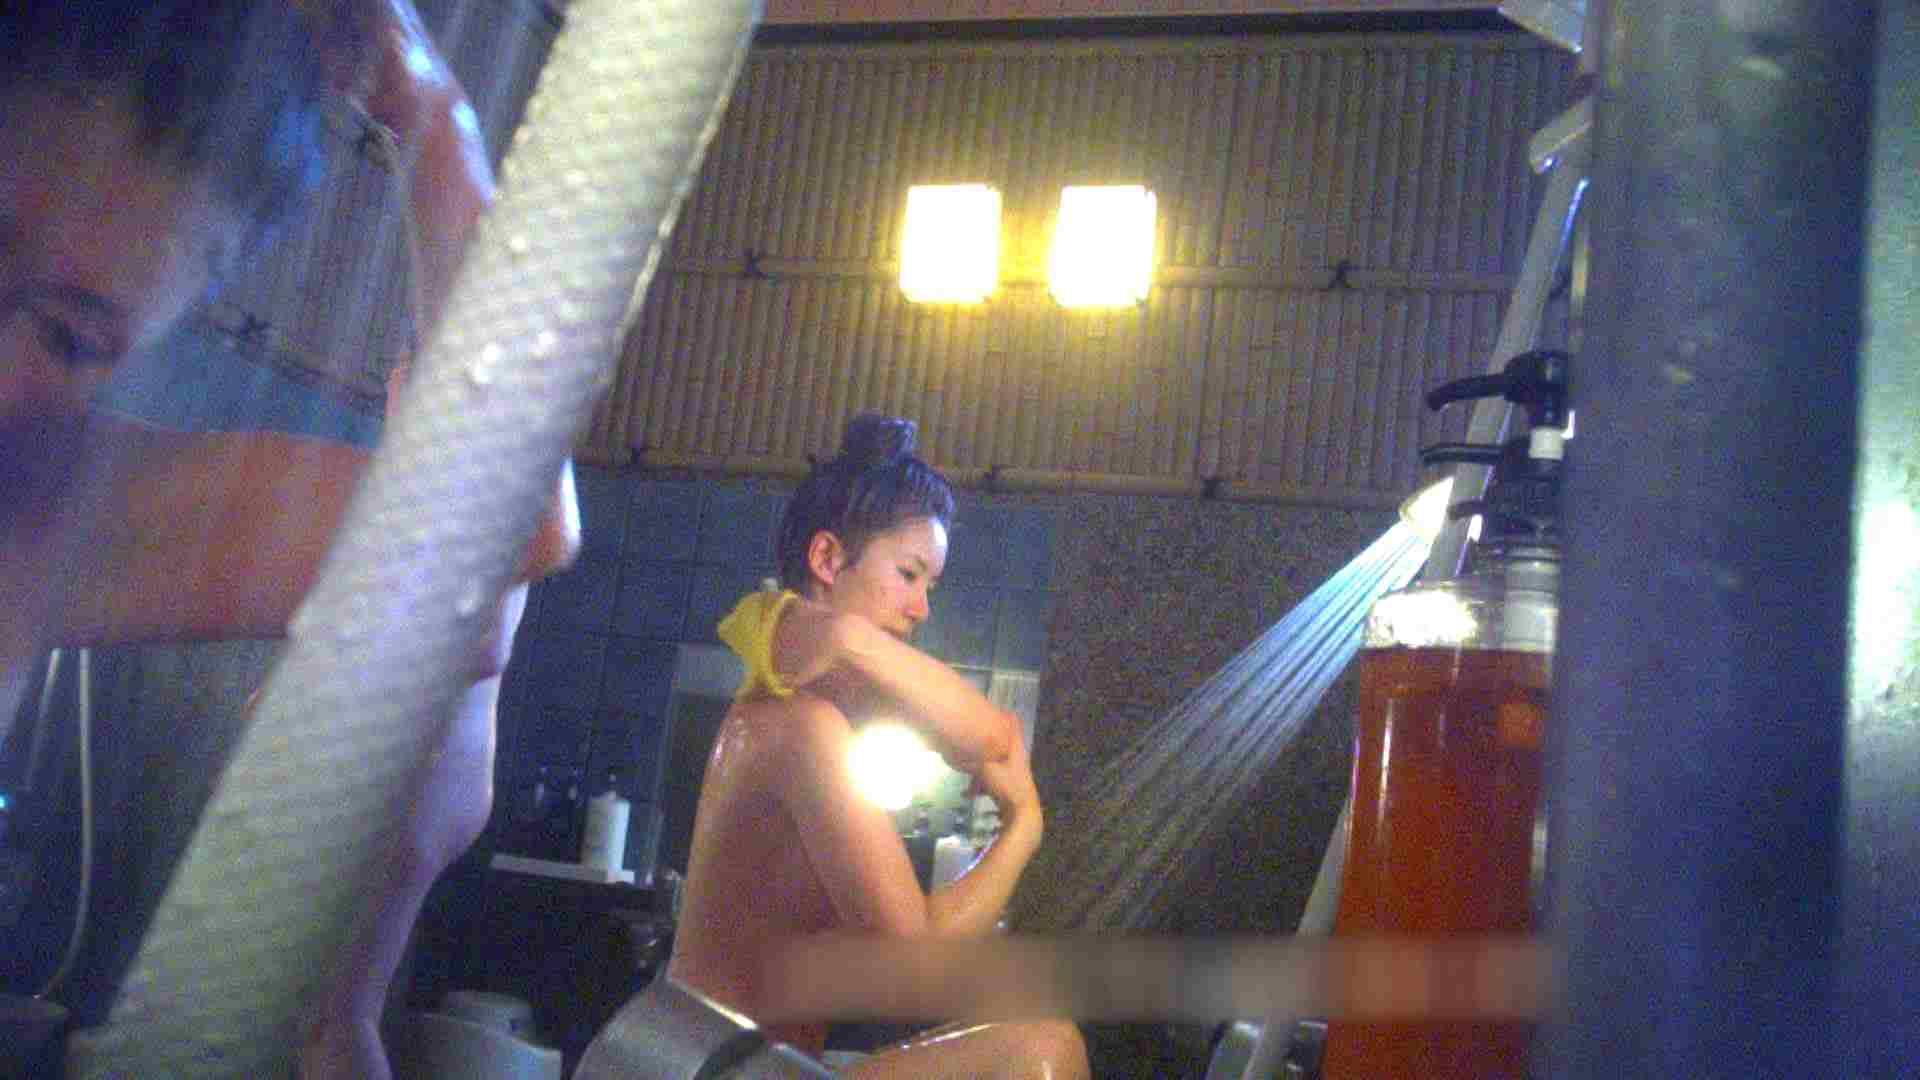 TG.15 【上等兵】高級旅館の爆乳女将で有名っぽい 潜入  86pic 65